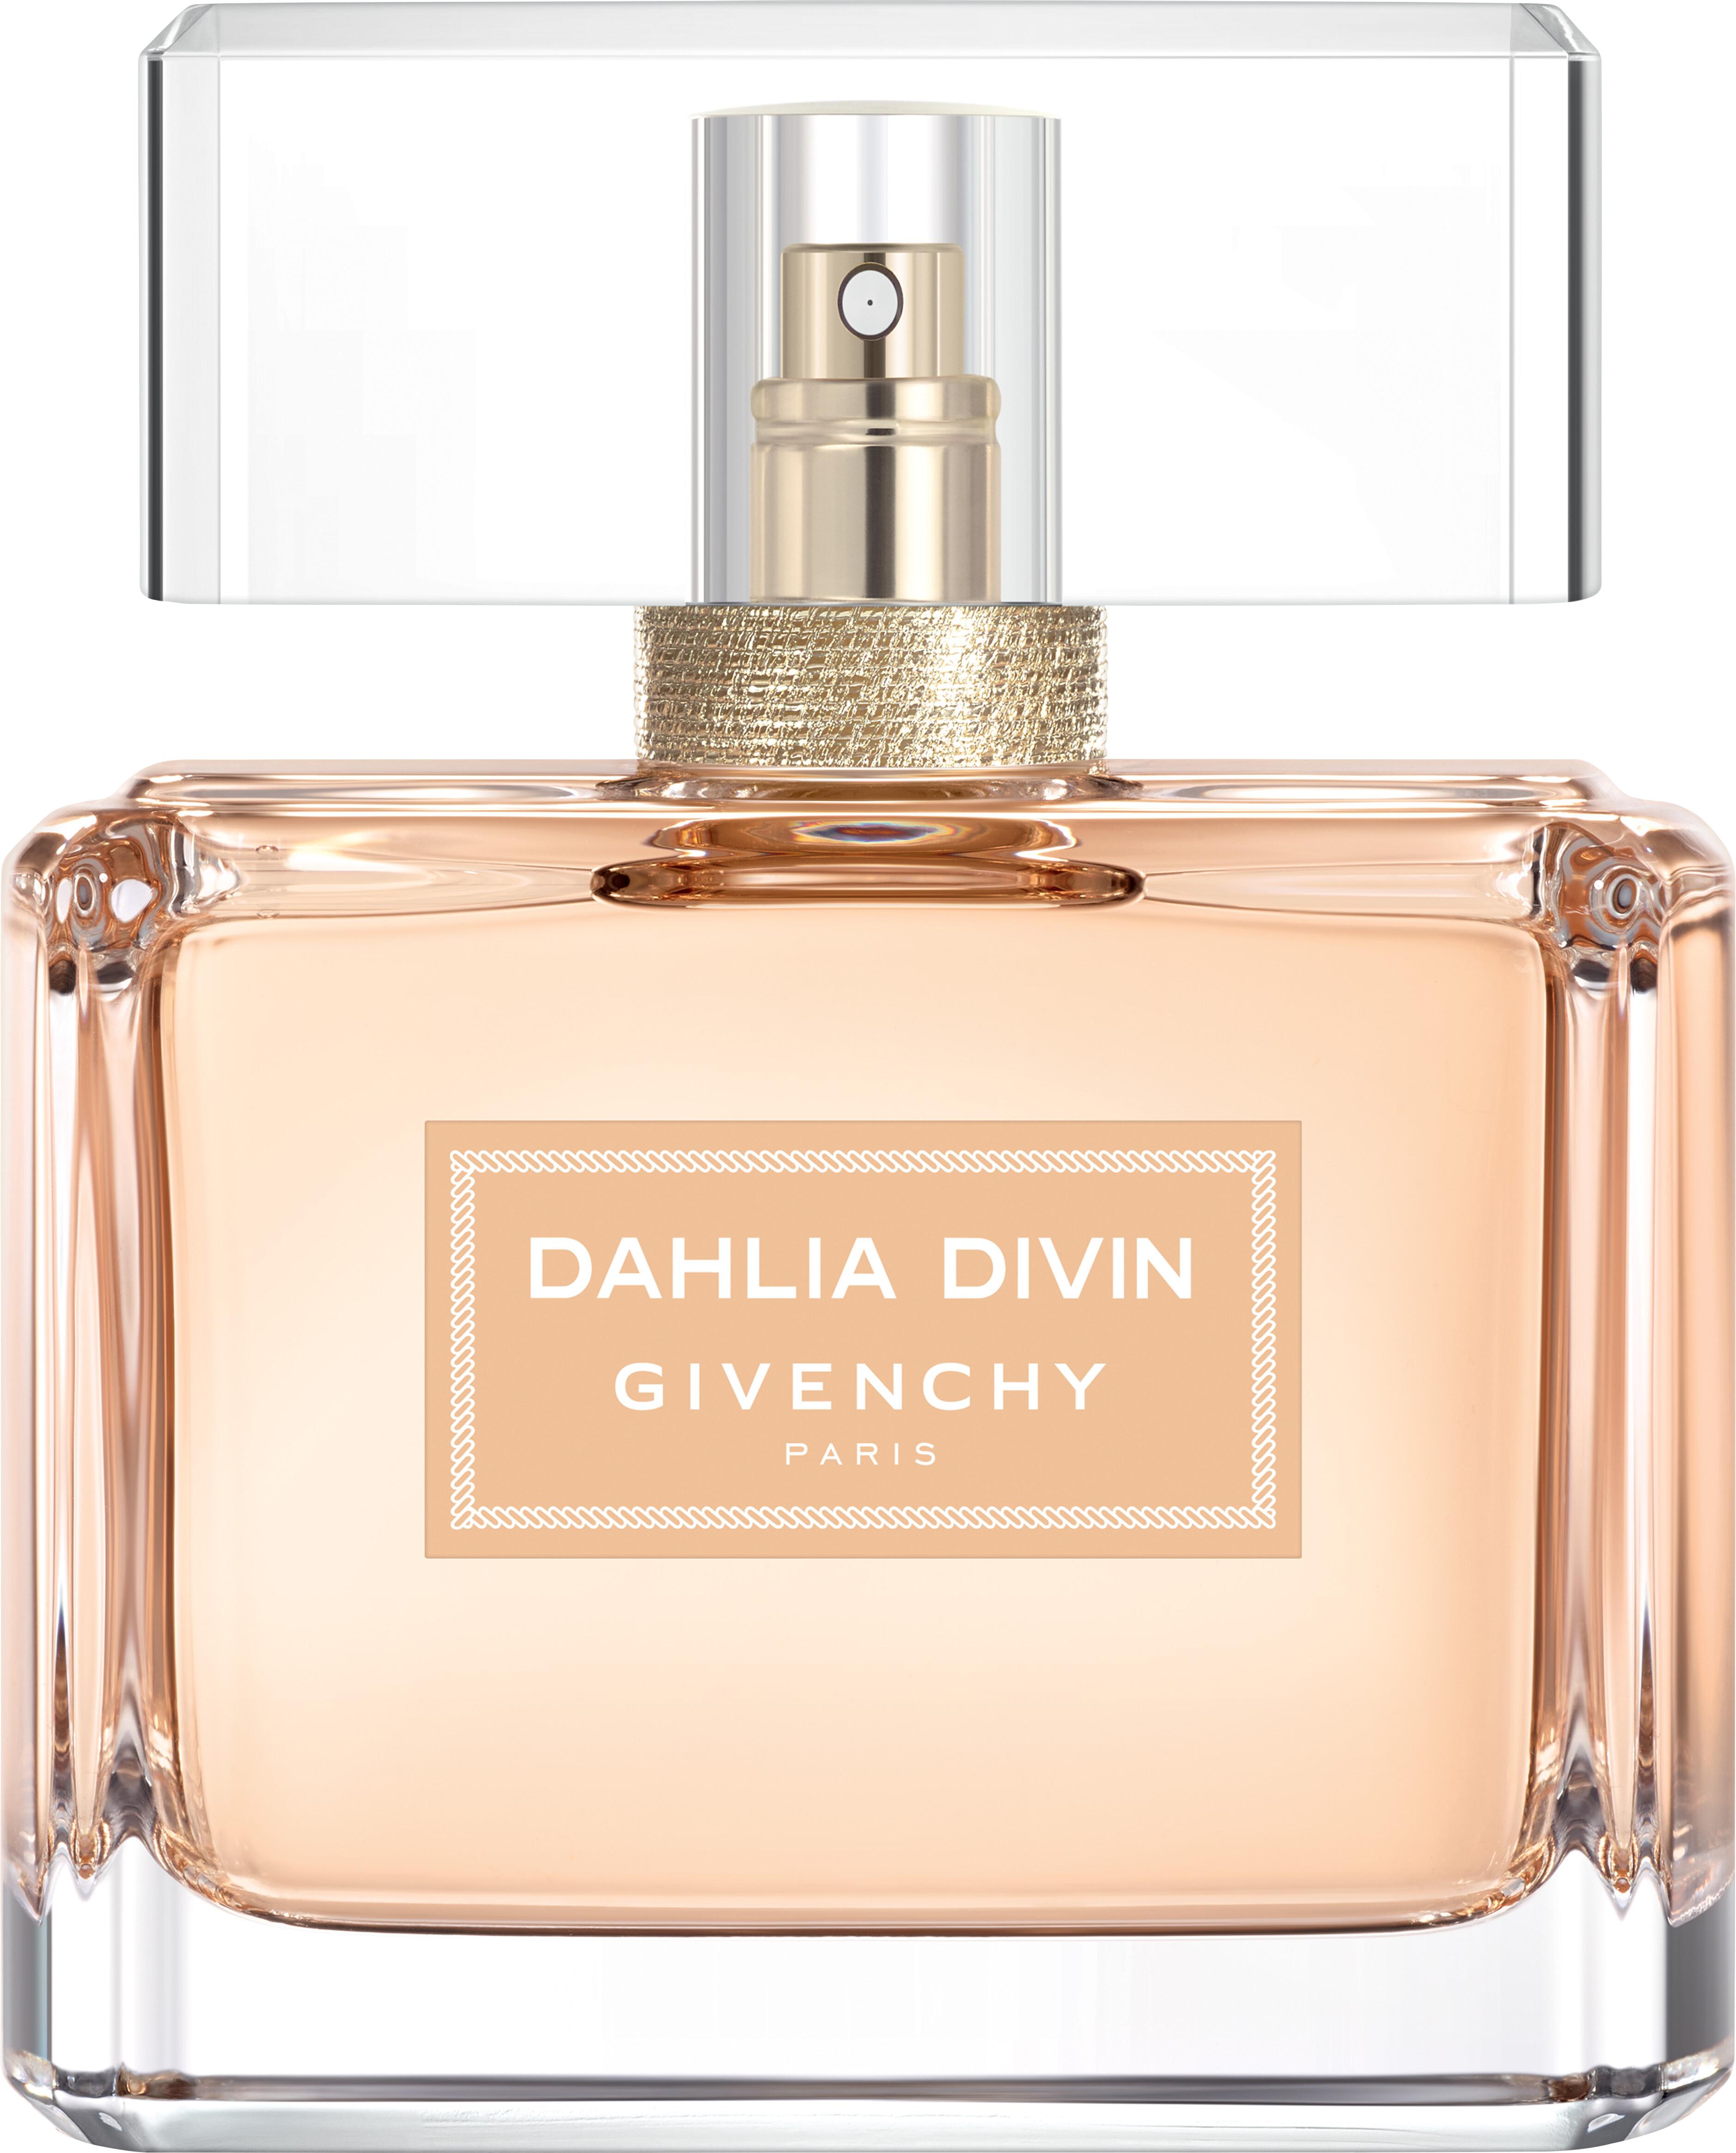 7fde1eae8f ... GIVENCHY Dahlia Divin Nude Eau de Parfum Spray 75ml